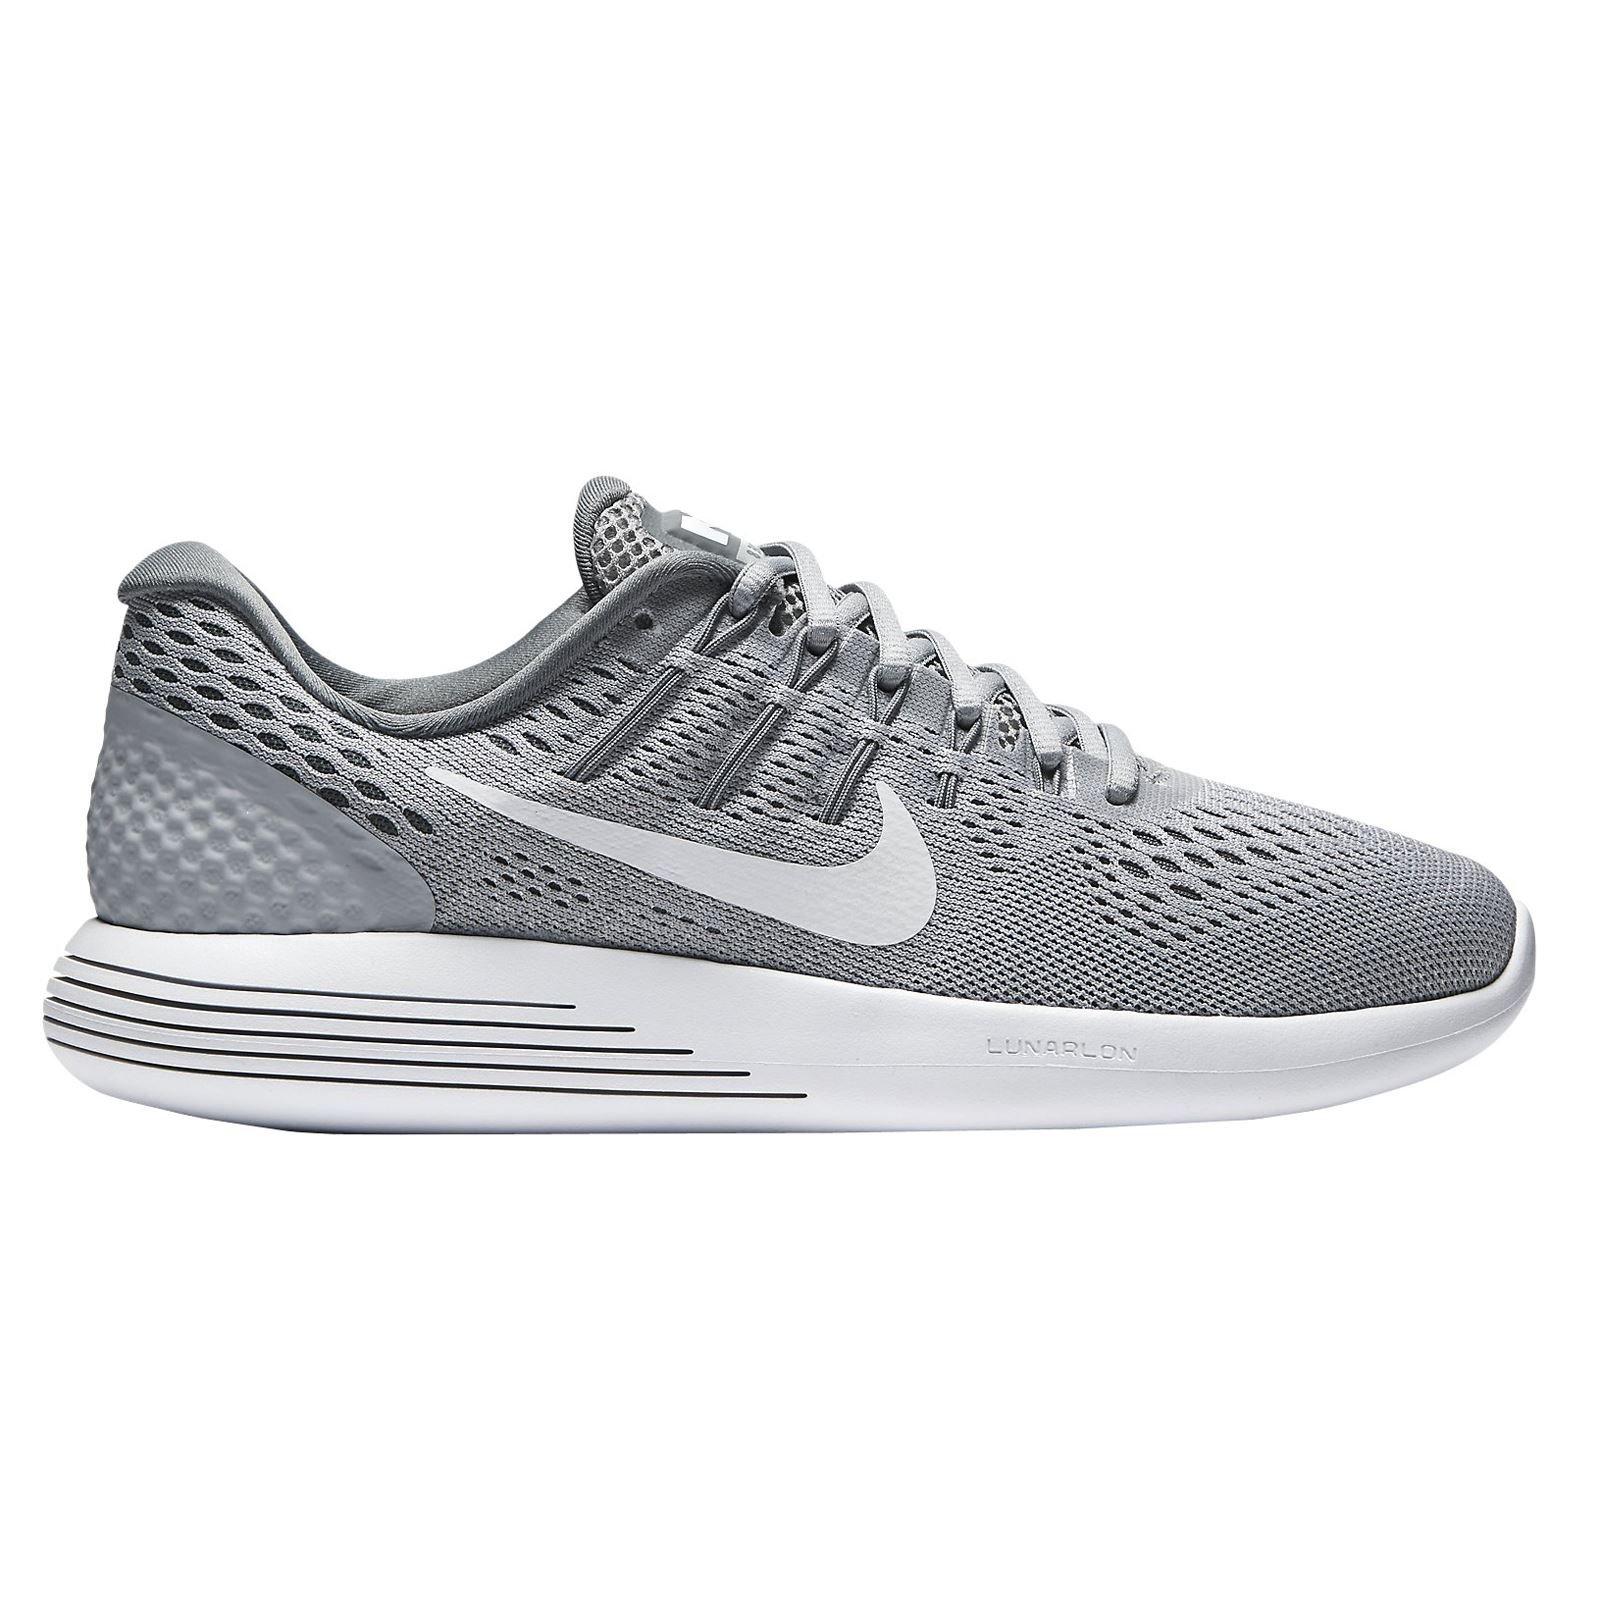 NIKE Women's Lunarglide 8 Running Shoe Wolf Grey/White Cool Grey 6.5